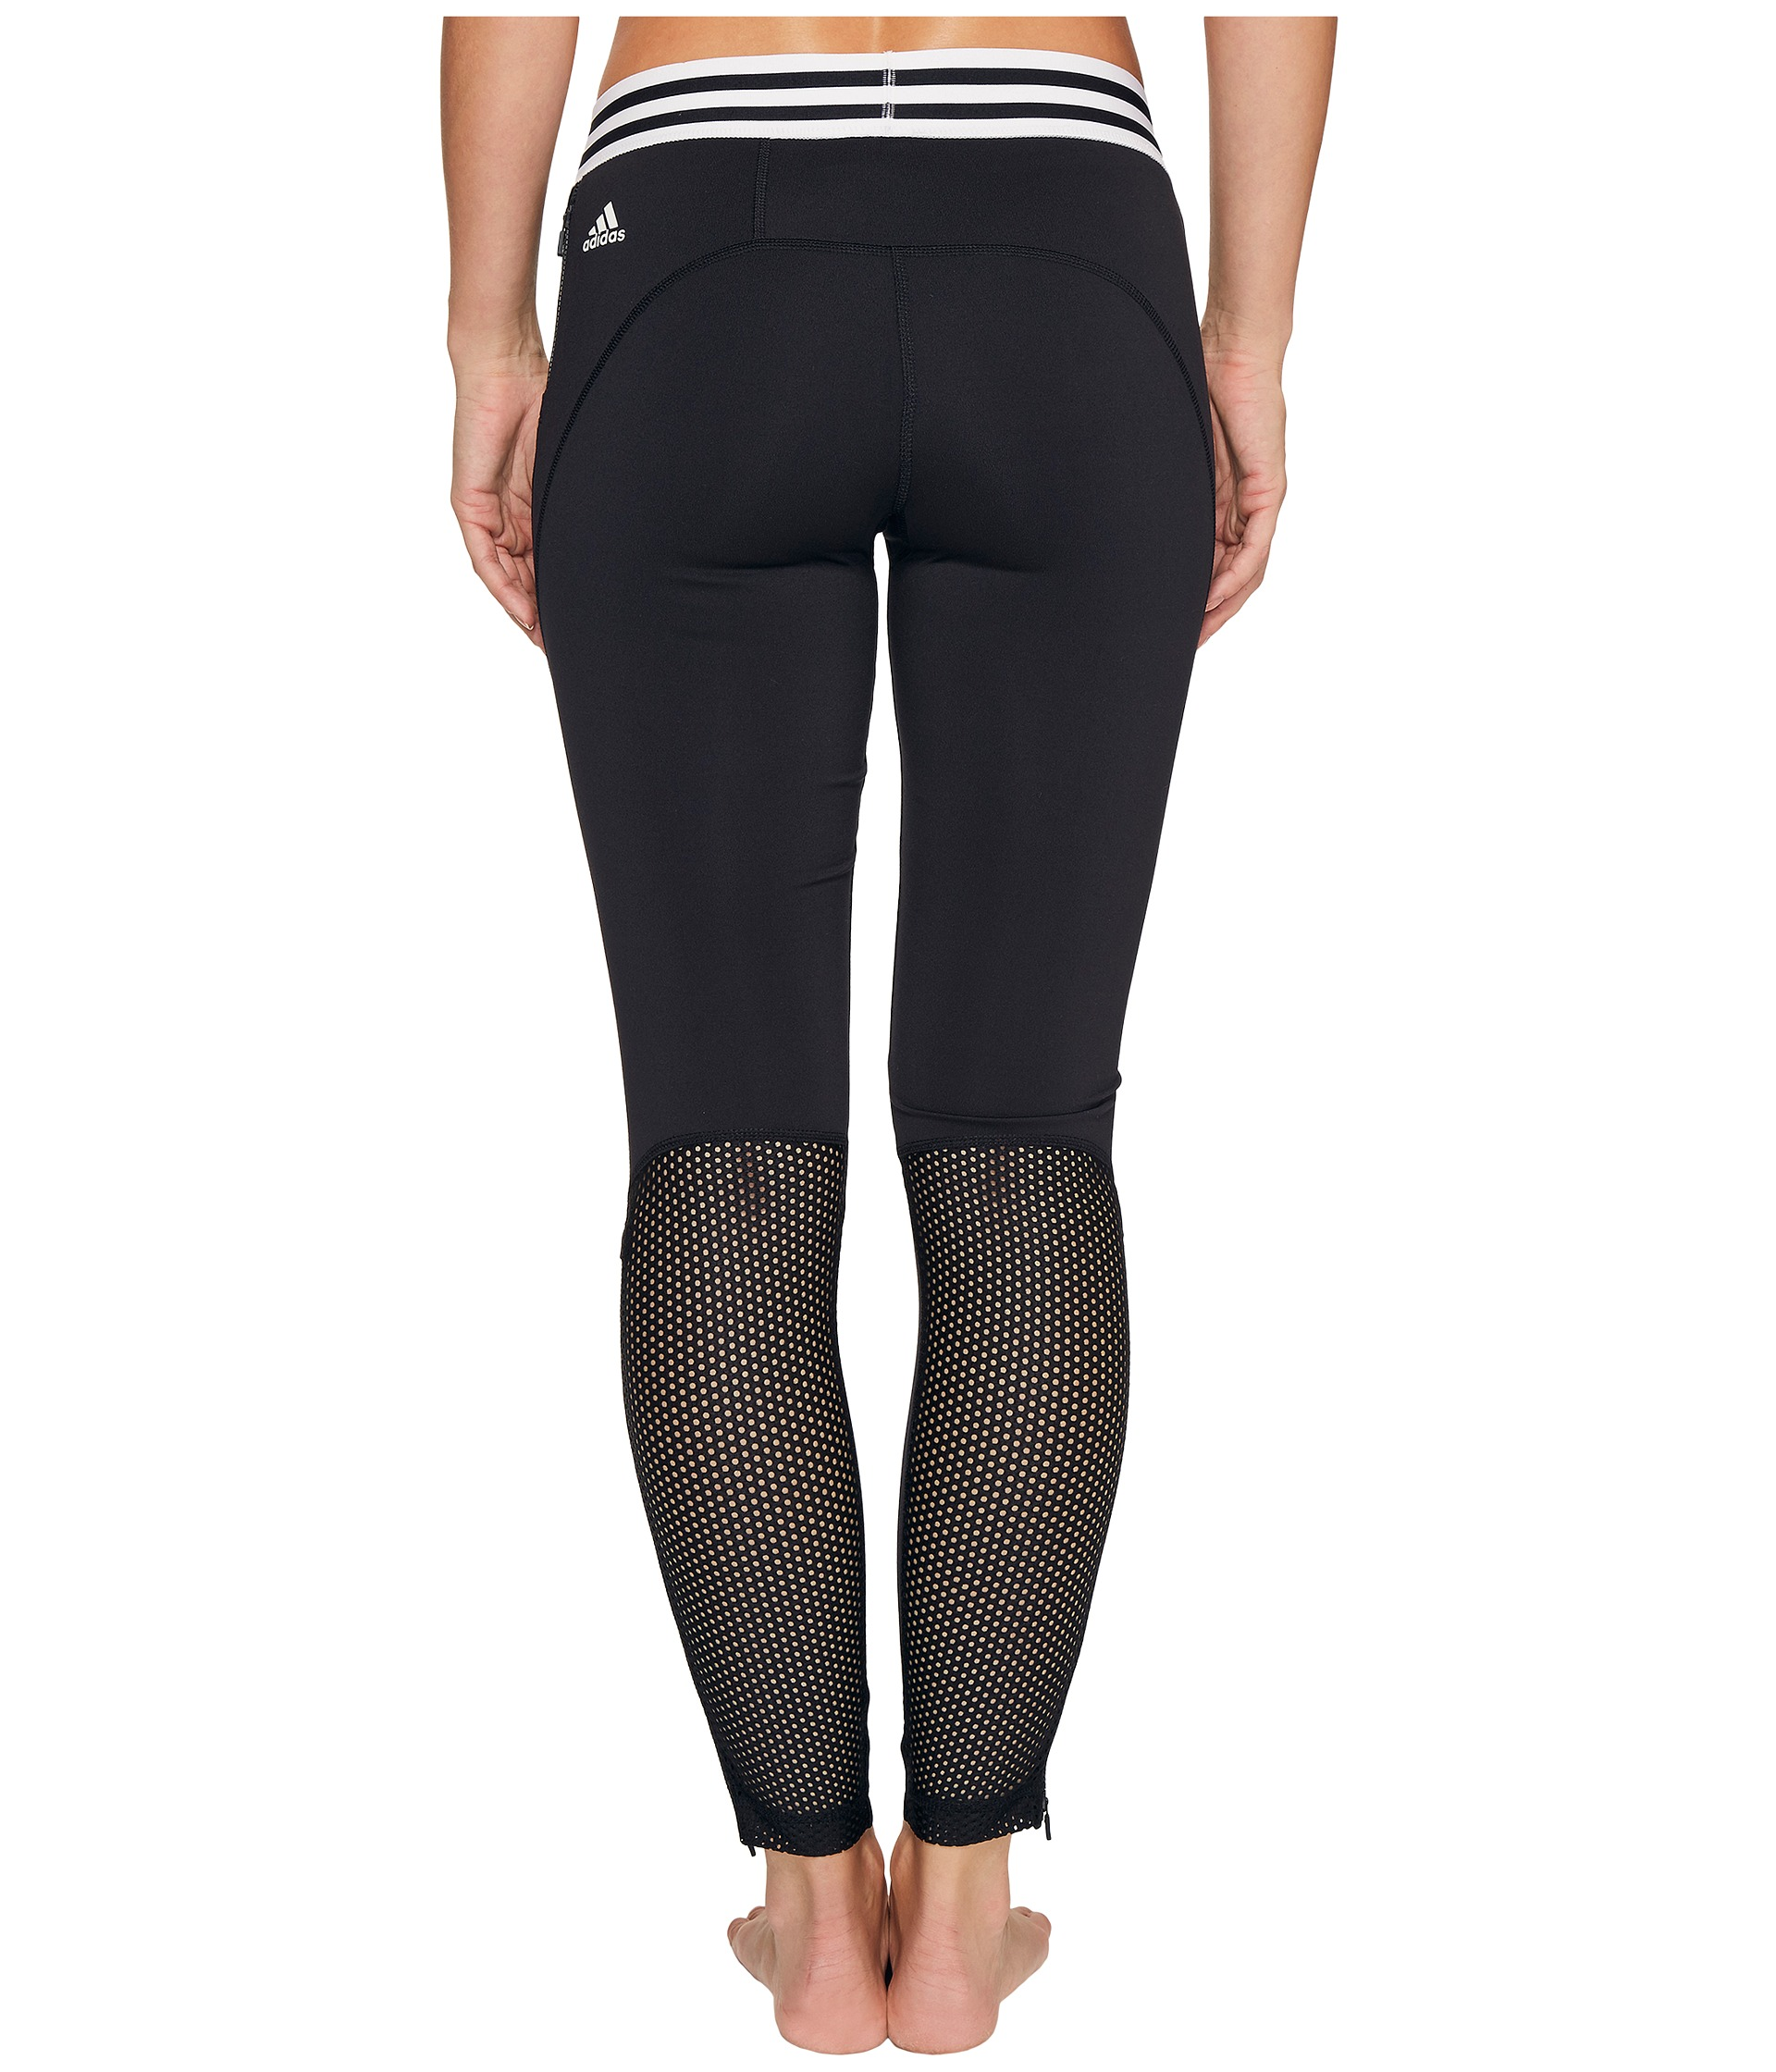 adidas sport id zipper leggings black free shipping both ways. Black Bedroom Furniture Sets. Home Design Ideas